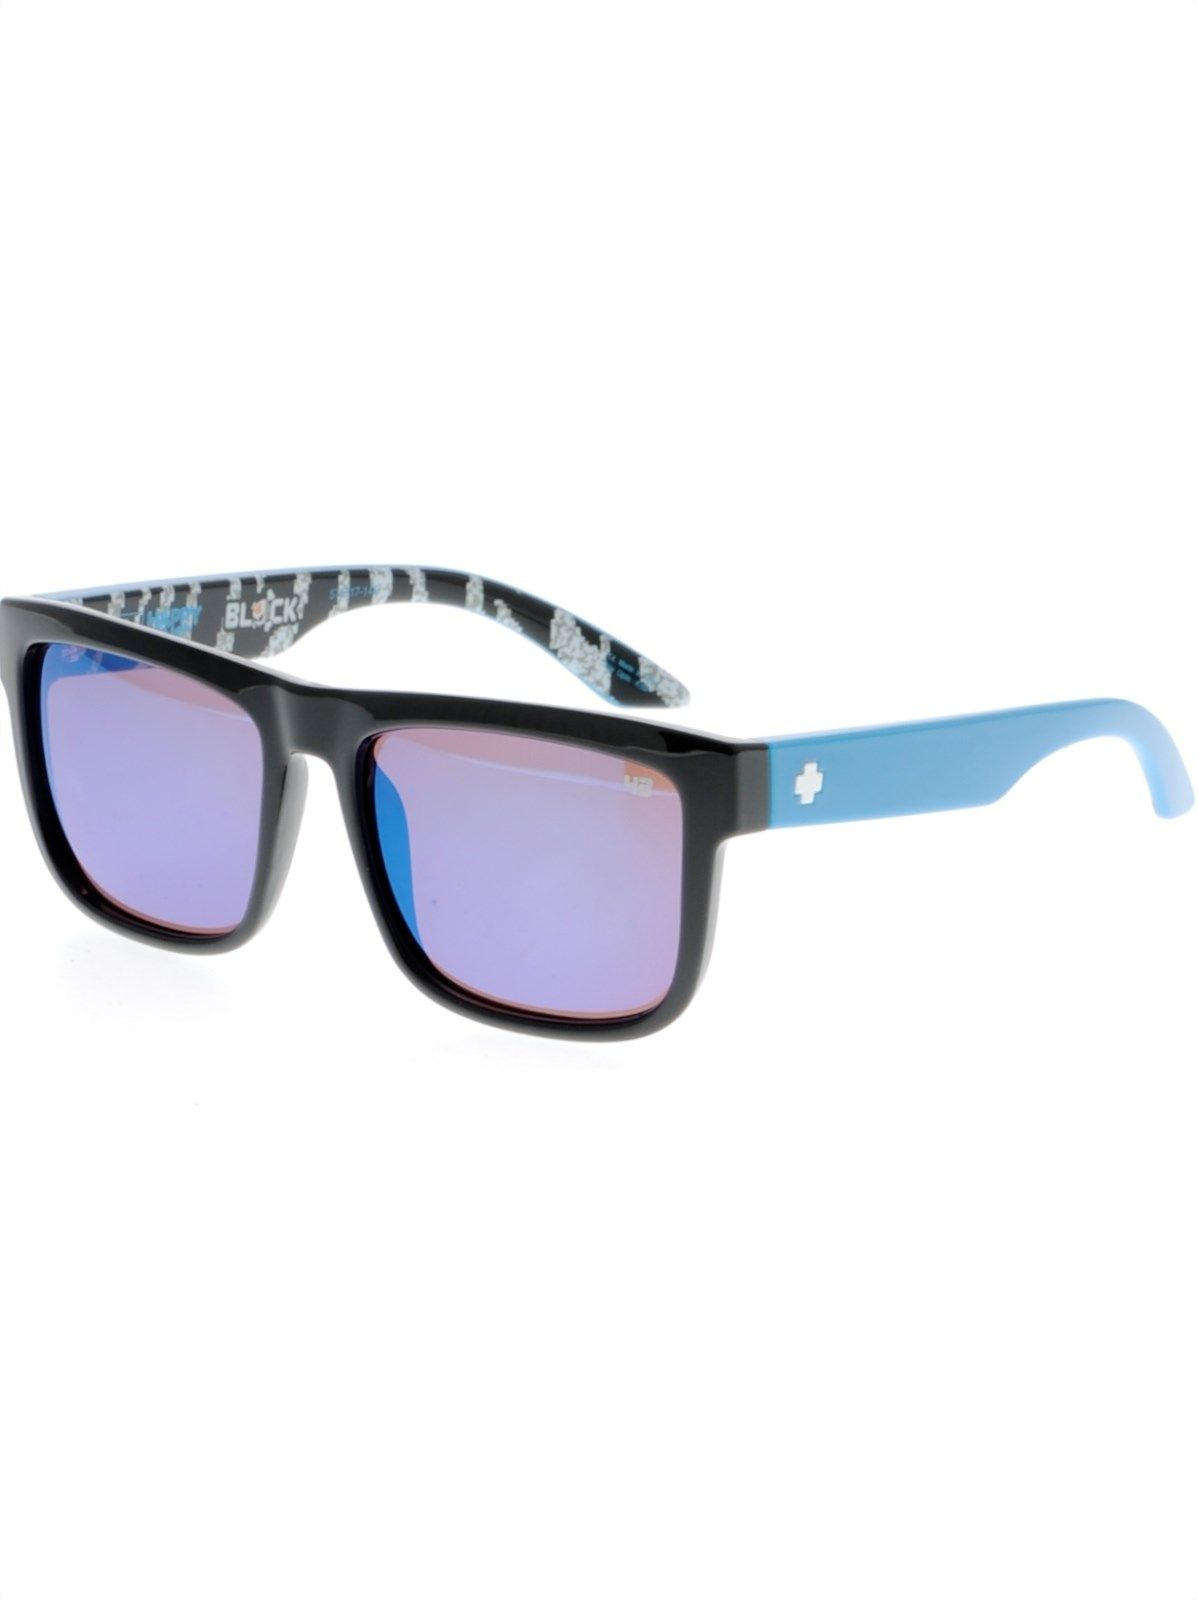 1968efa17 Spy Livery Black-Happy Bronze-Dark Blue Spectra Ken Block Discord Sunglasses  | Spy | FreestyleXtreme